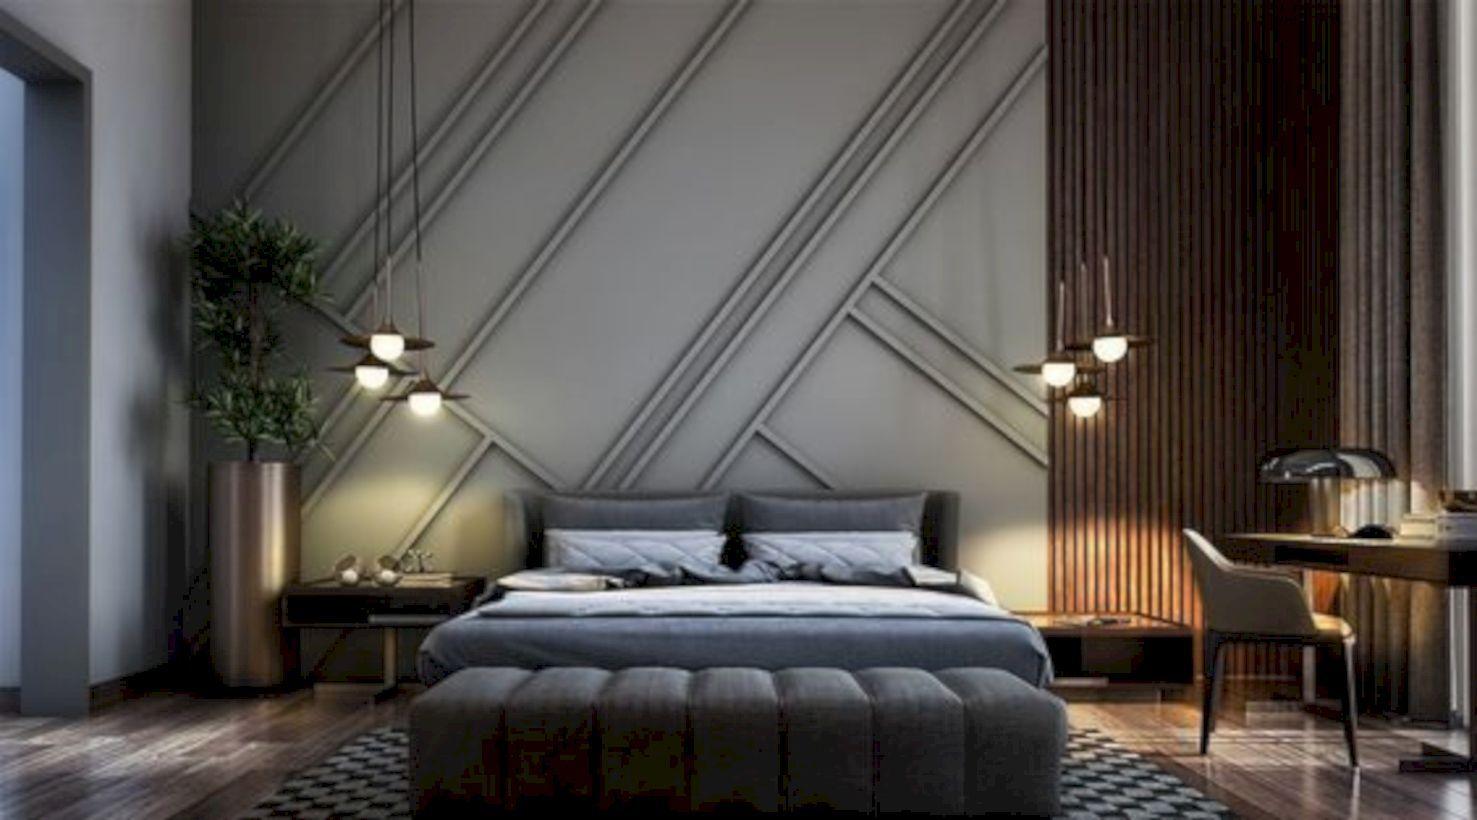 44 Small Master Bedroom Decor Ideas